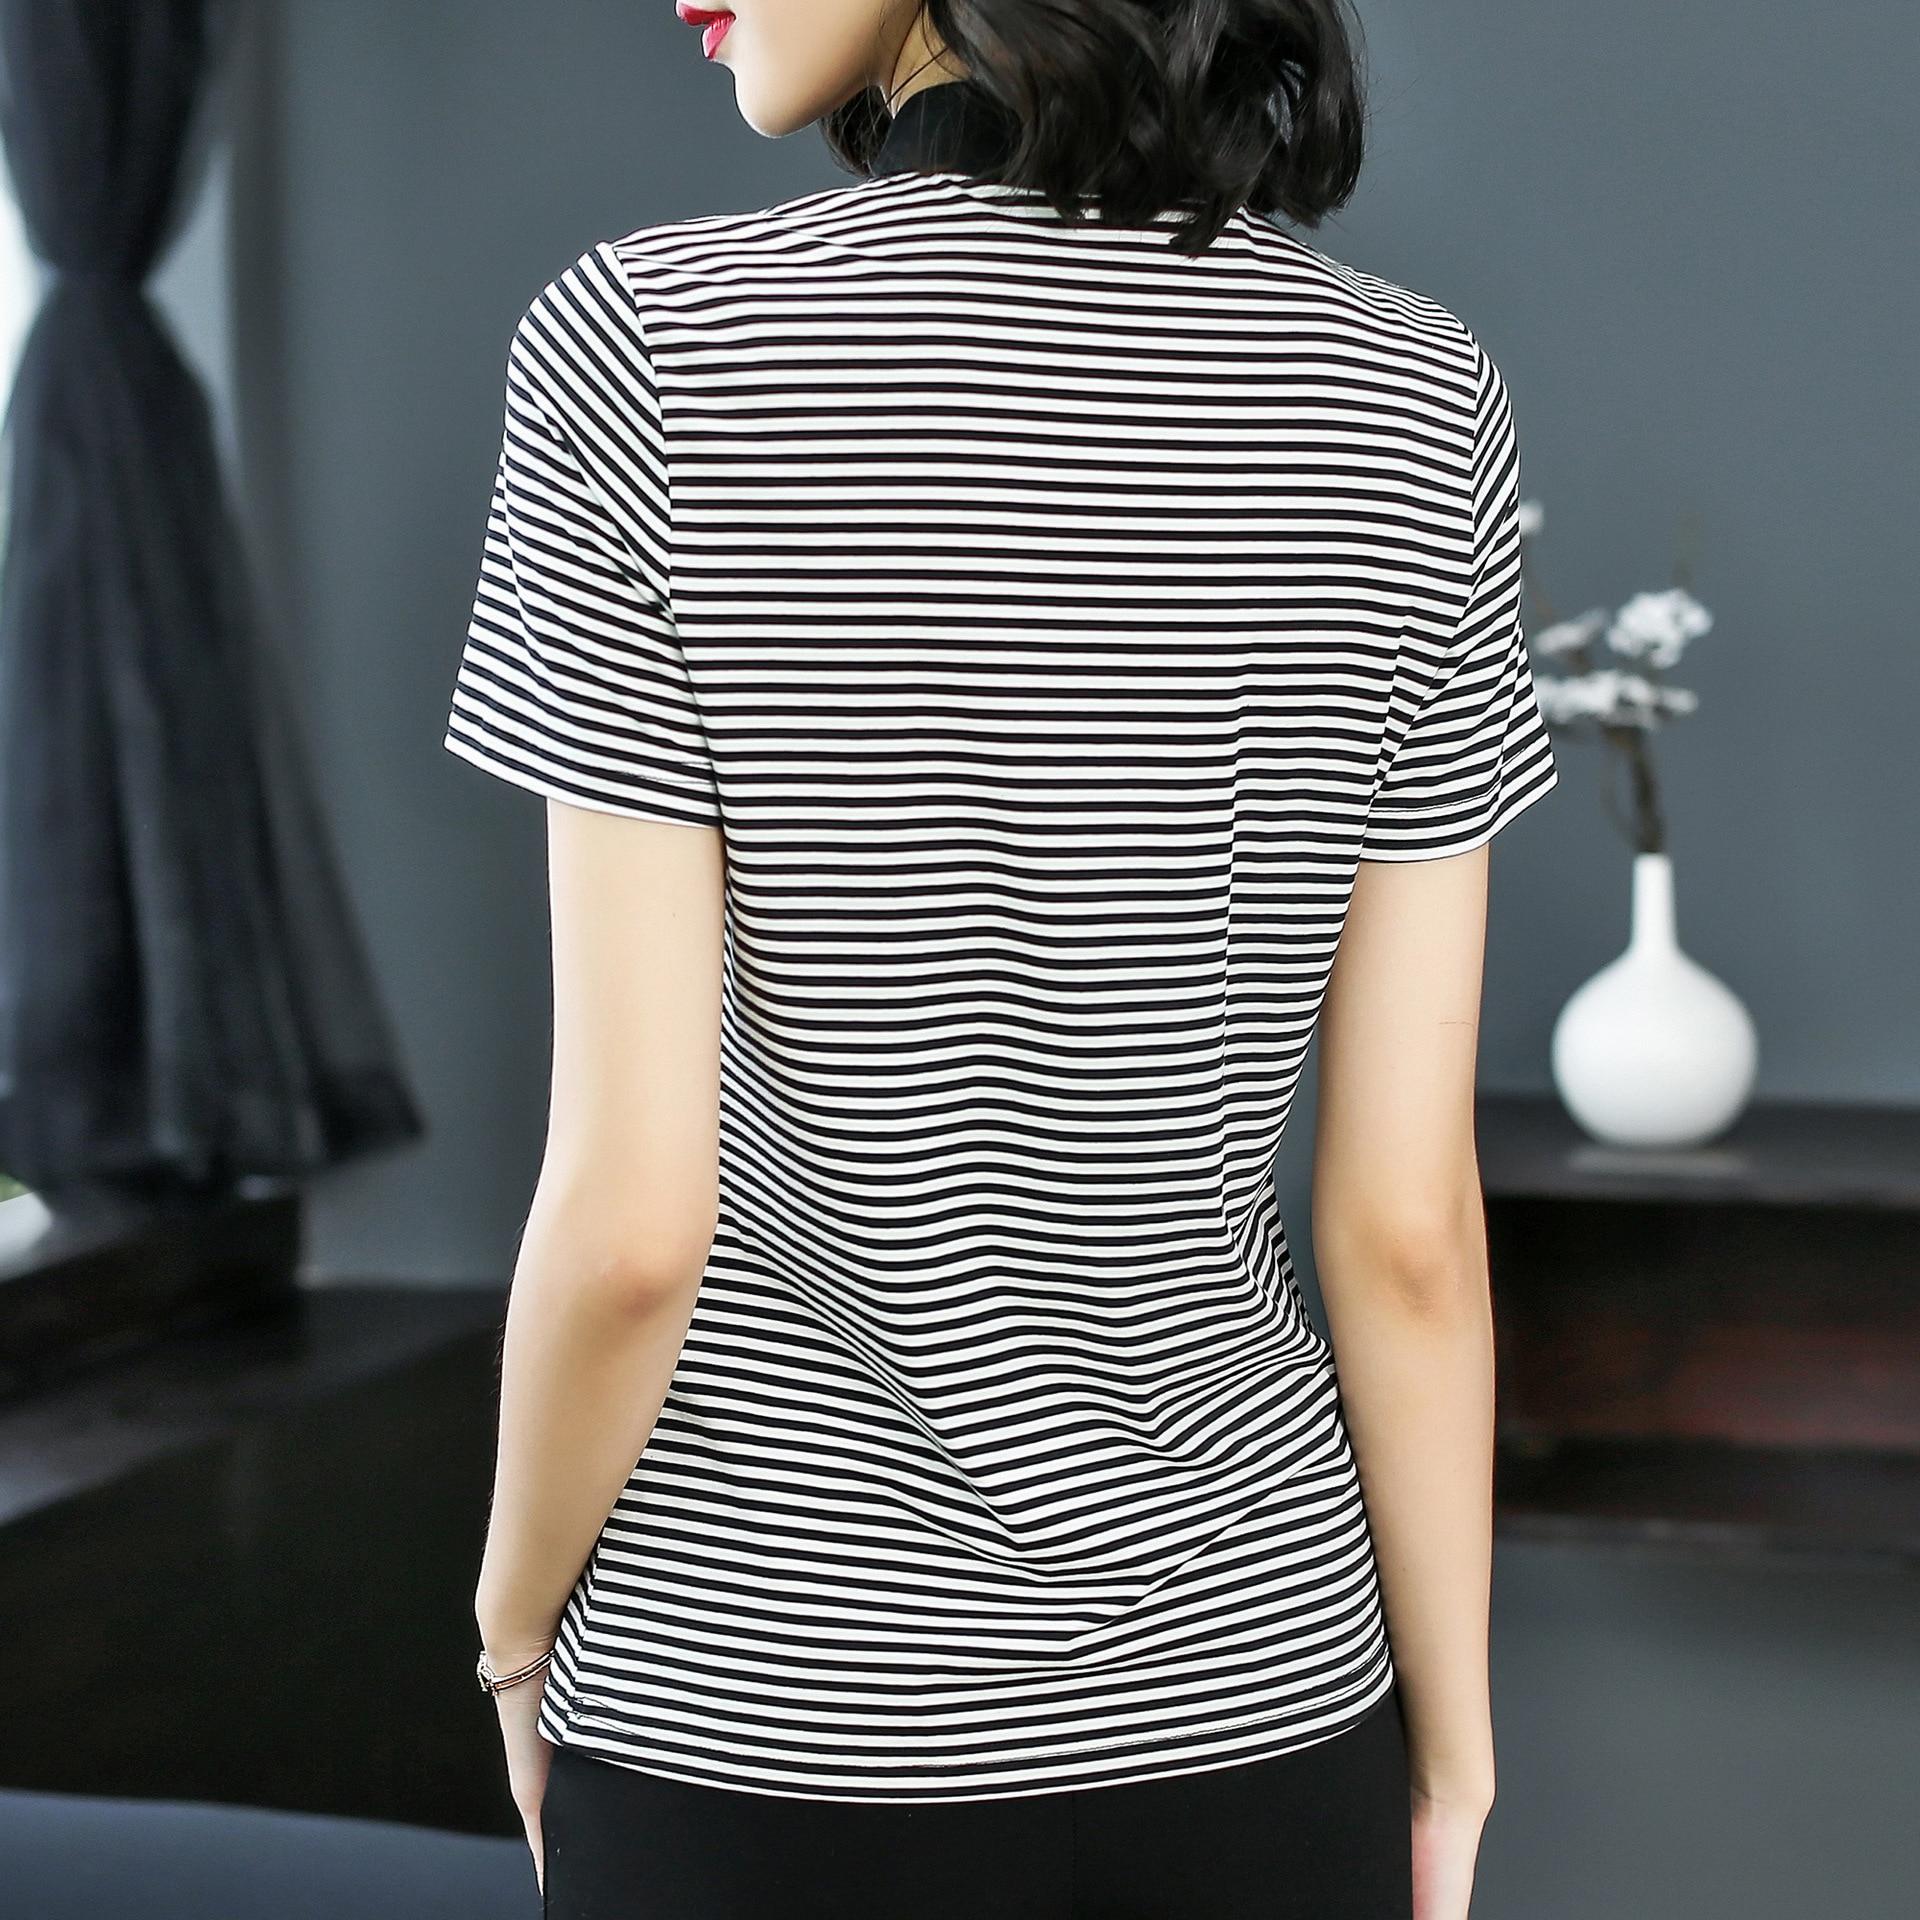 De Camisetas Moda Mujer Turn Europa Dulces Verano Calle Camisas Collar Mujeres Down Stripe Camiseta blanco negro 2018 Suelta Lentejuelas Alta Patchwork Tops UxxBYEF